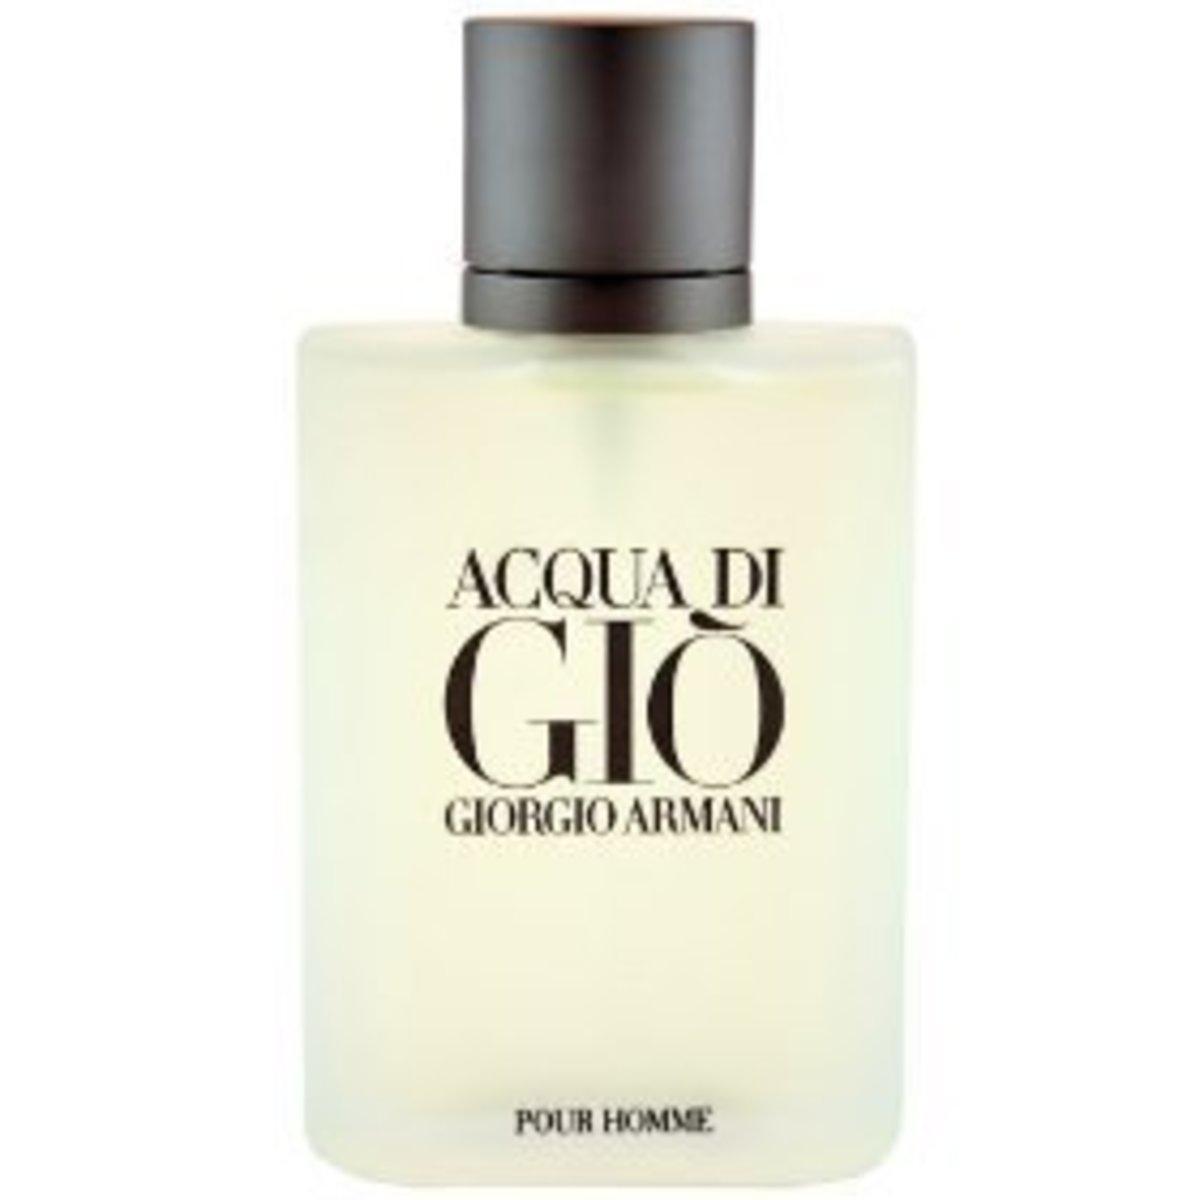 Acqua di Gioia: Not Quite an Acqua di Gio for Women, Sadly